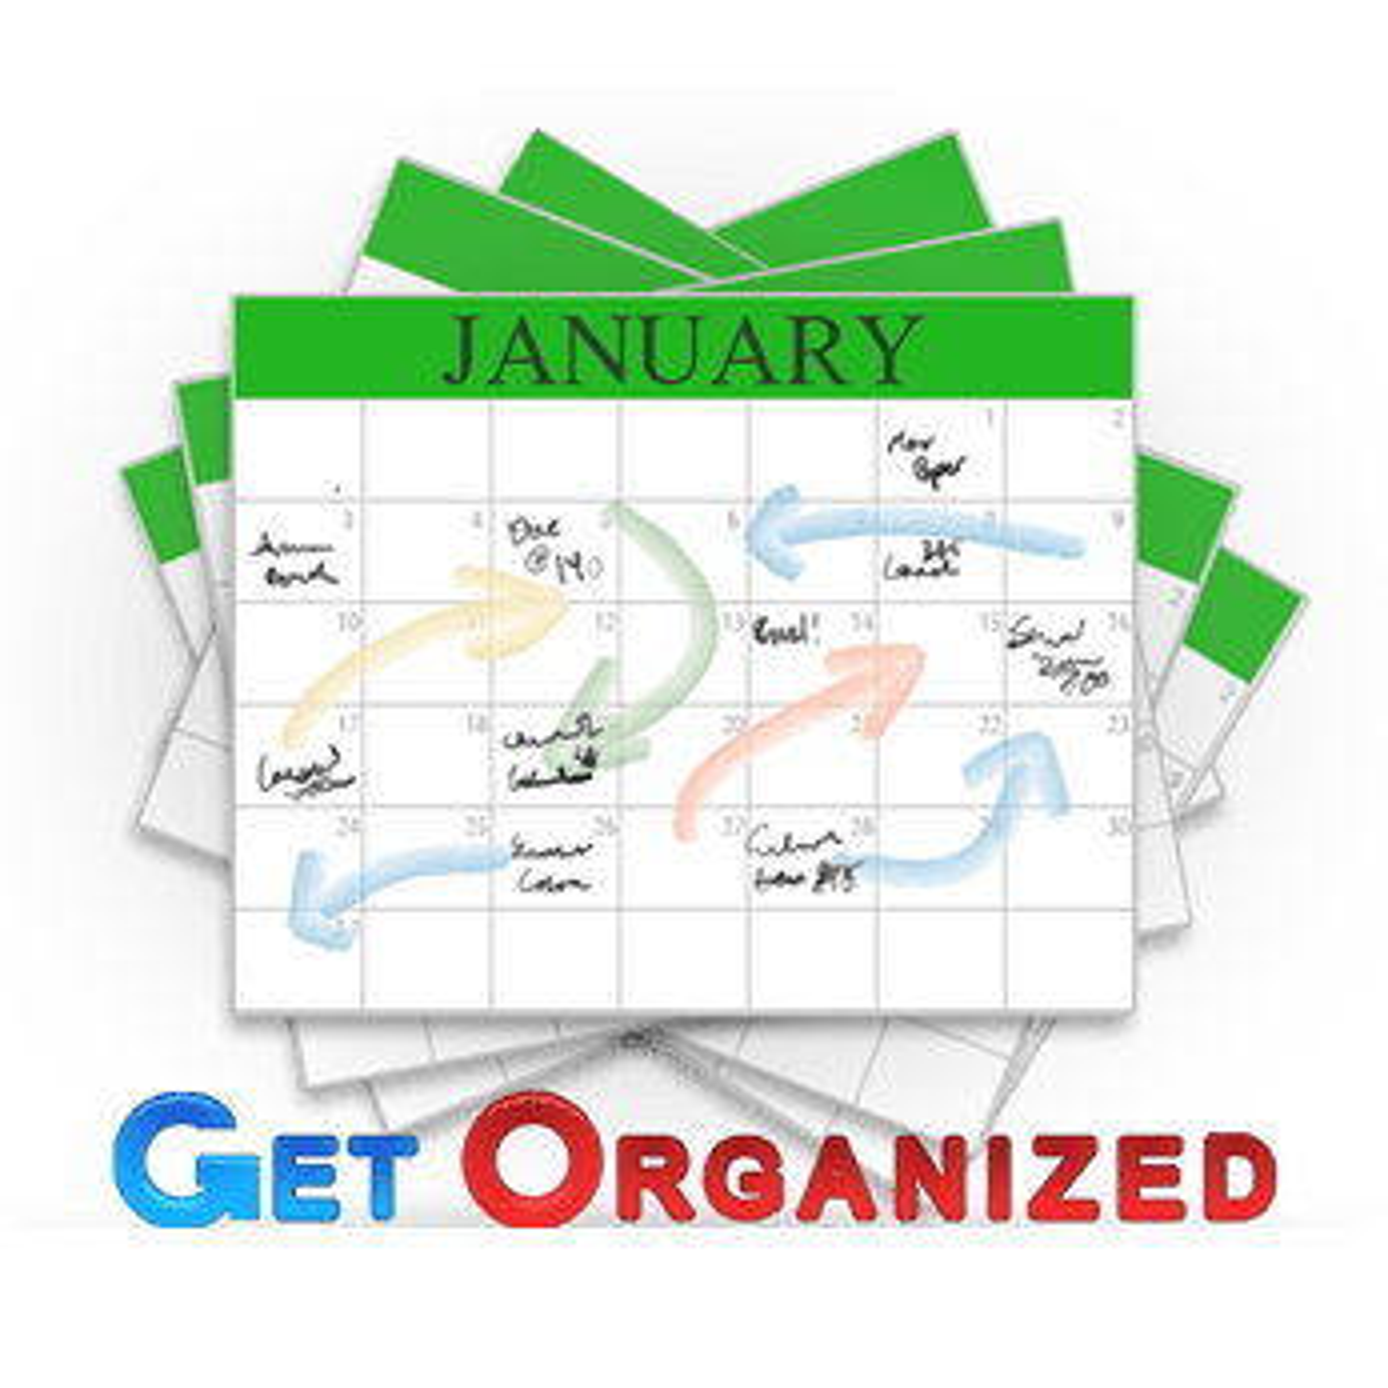 Get Organized 1.09 Beta